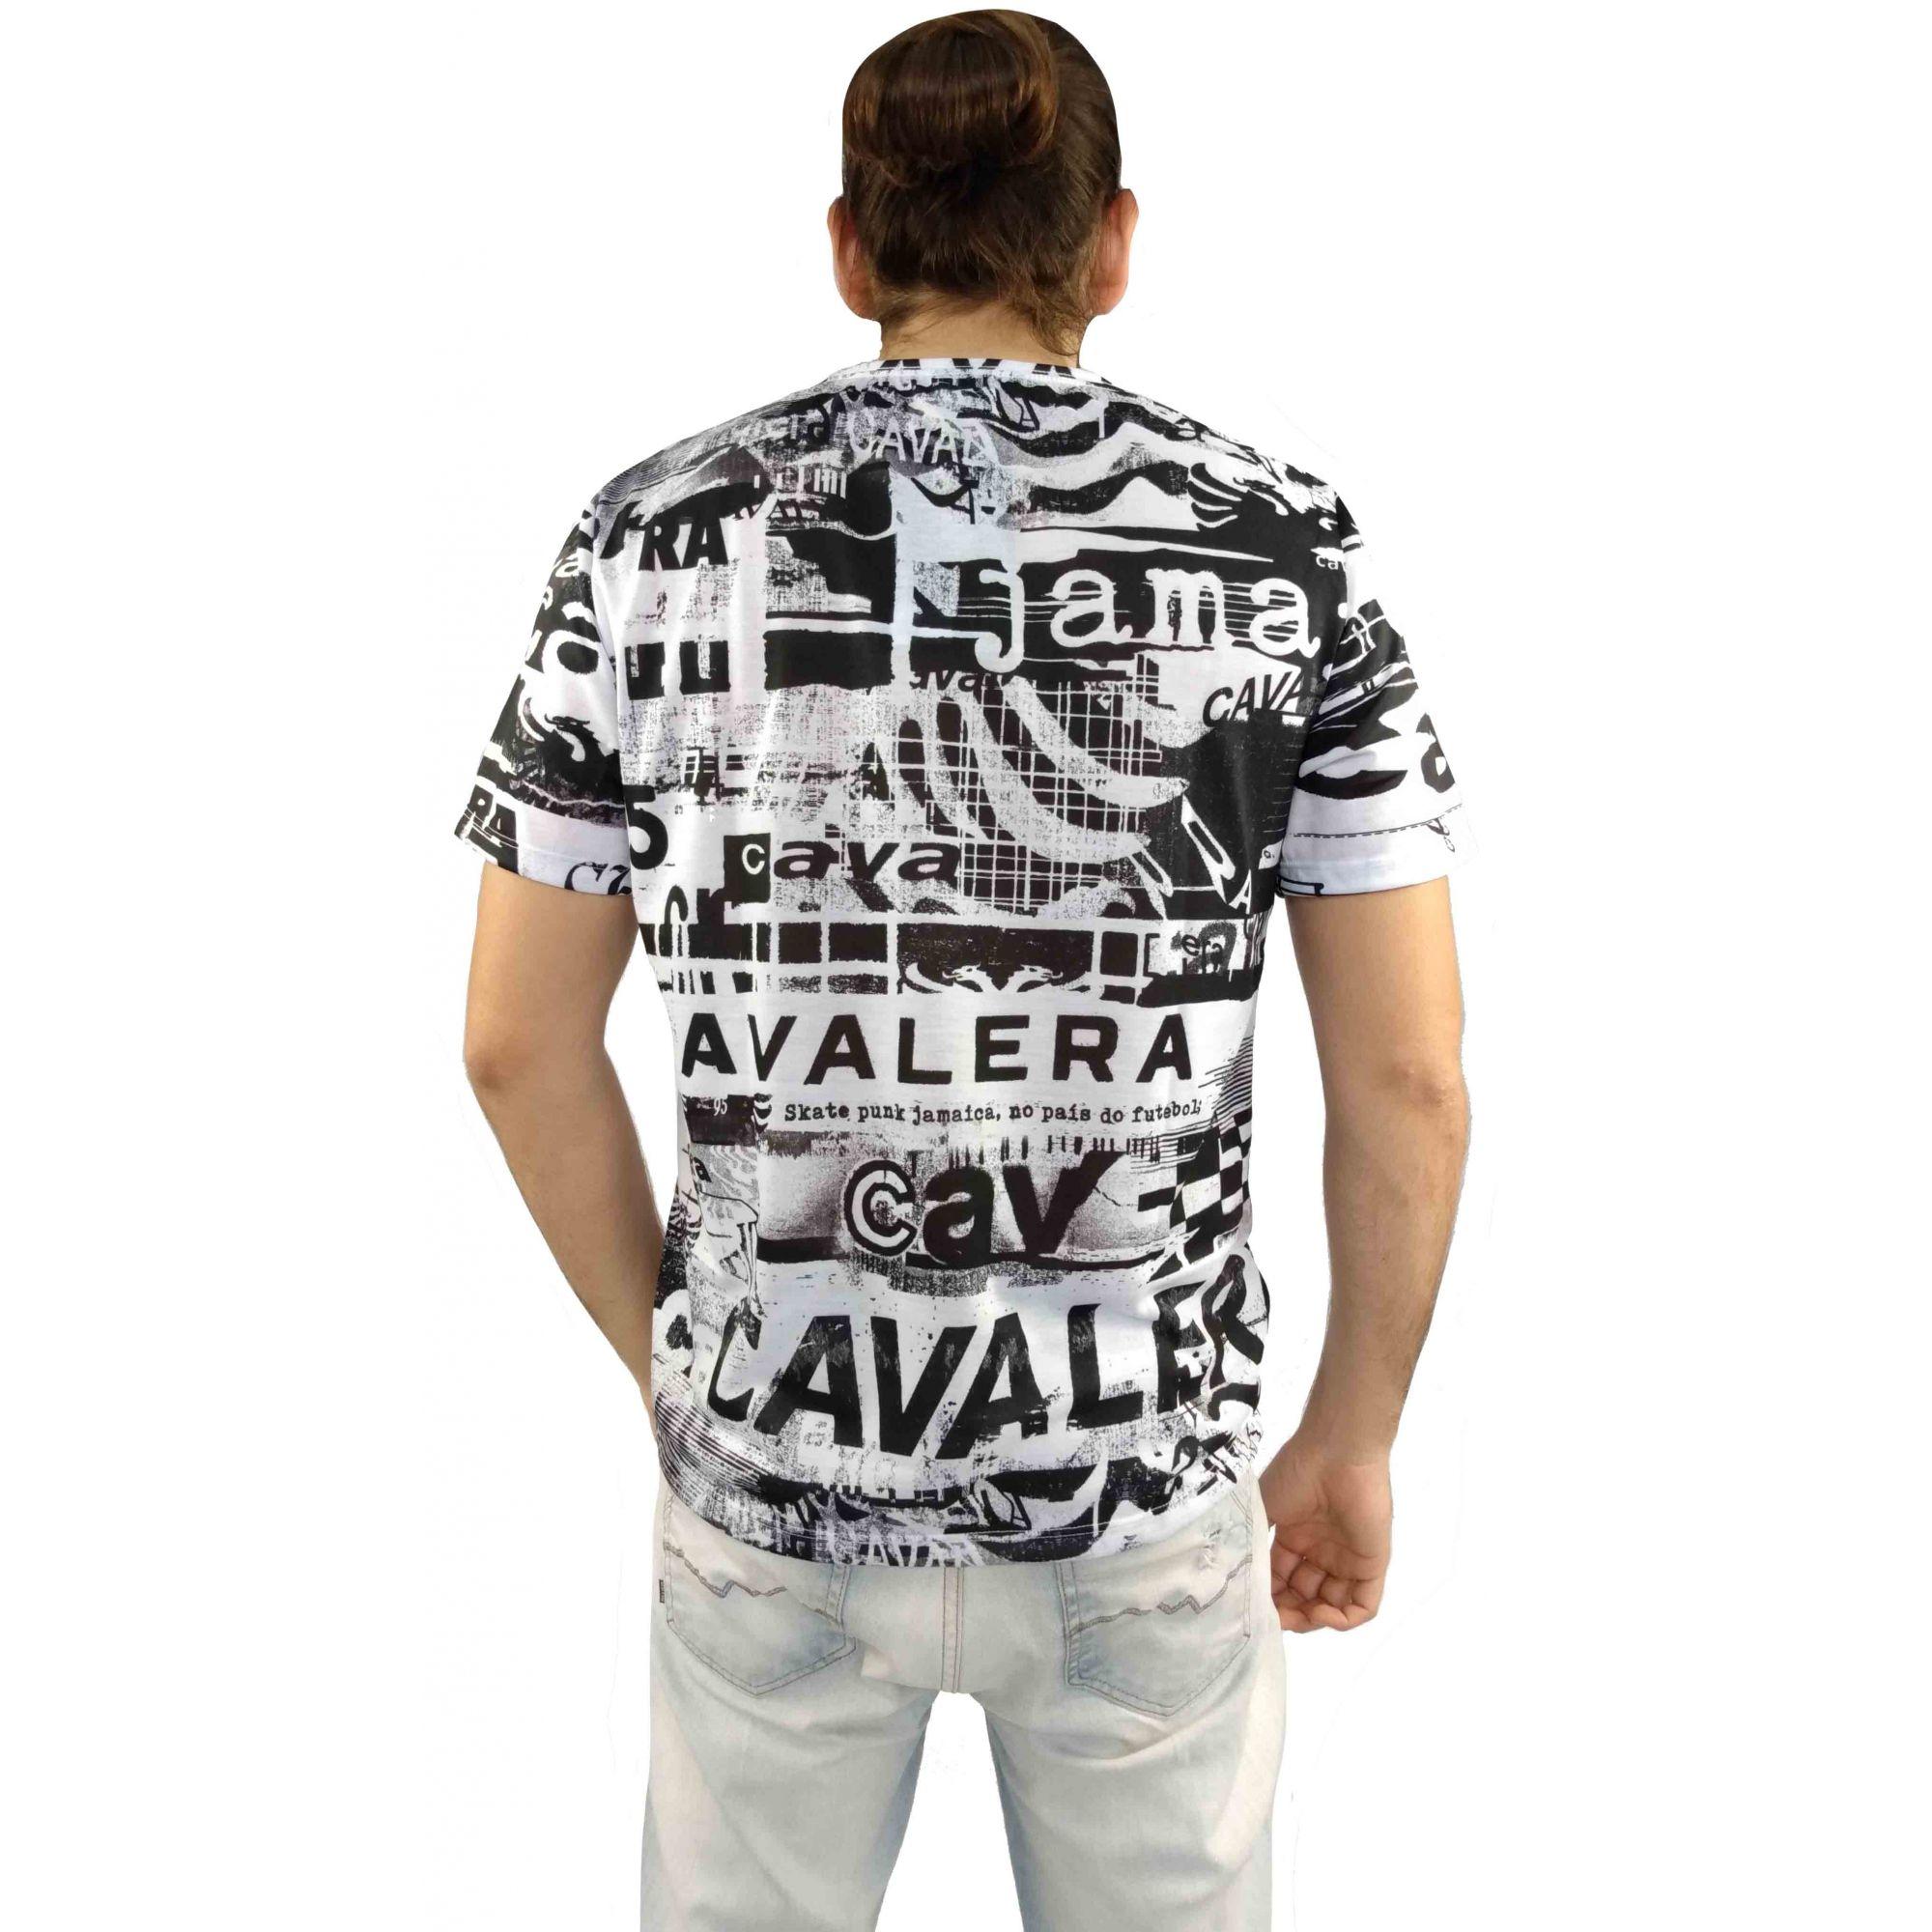 Camiseta Cavalera Masculina Estampada Preta e Branca